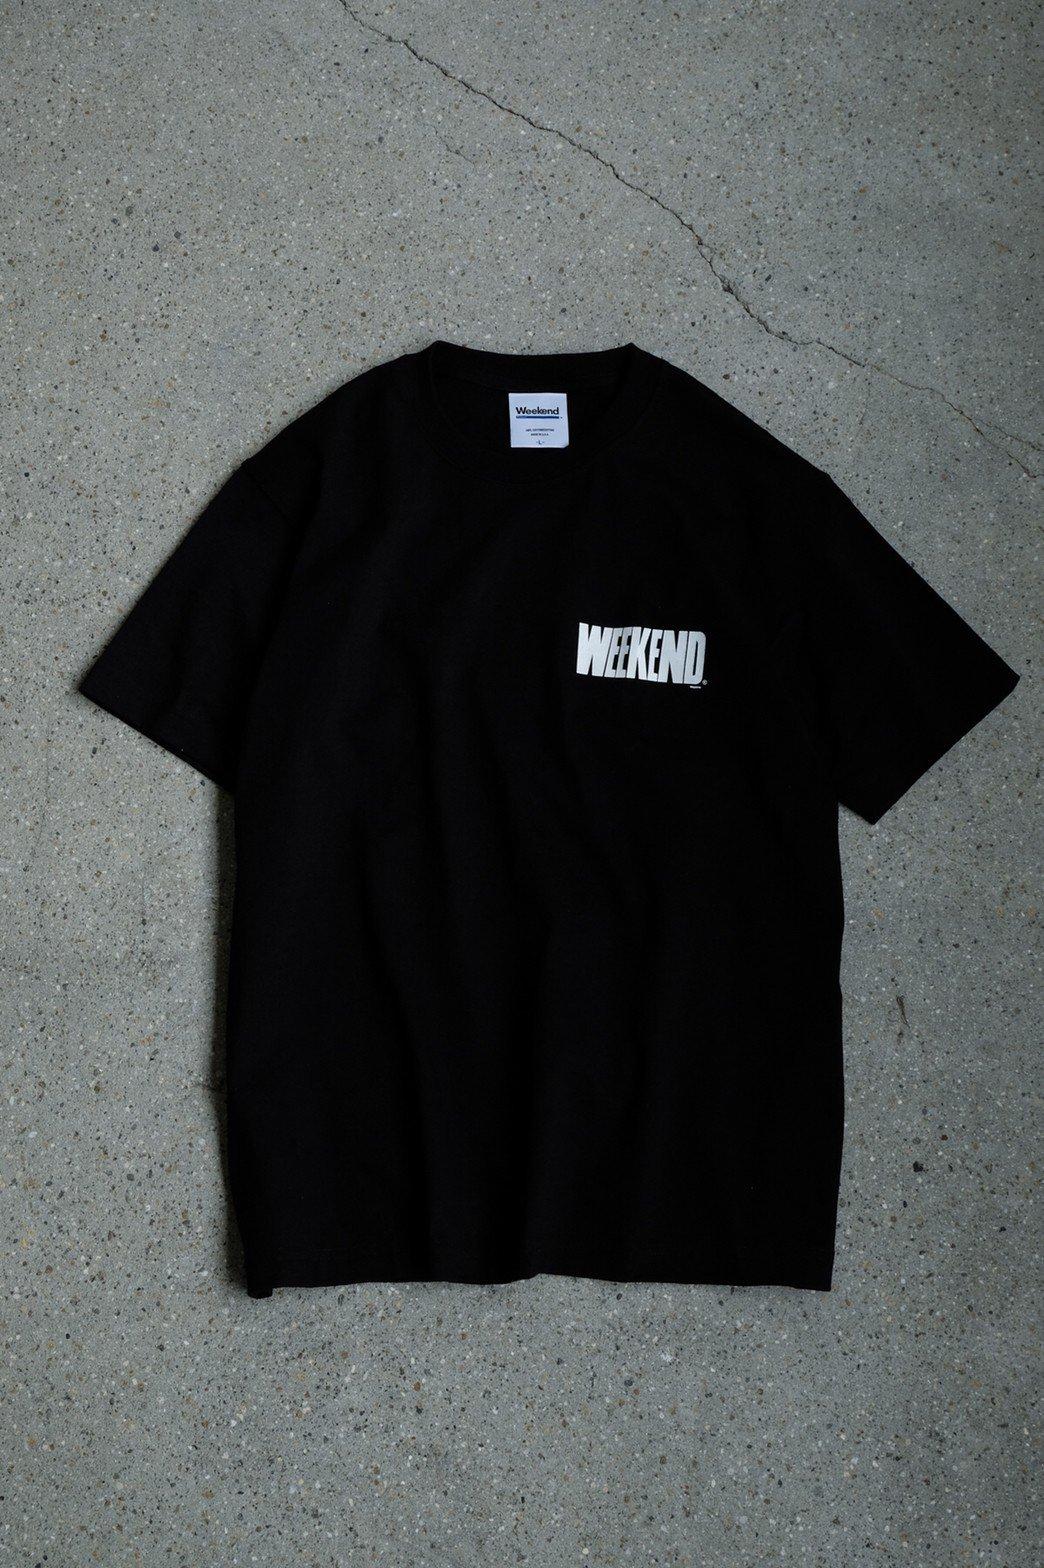 WEEKEND / WEEKEND Magazine T-shirt BLACK